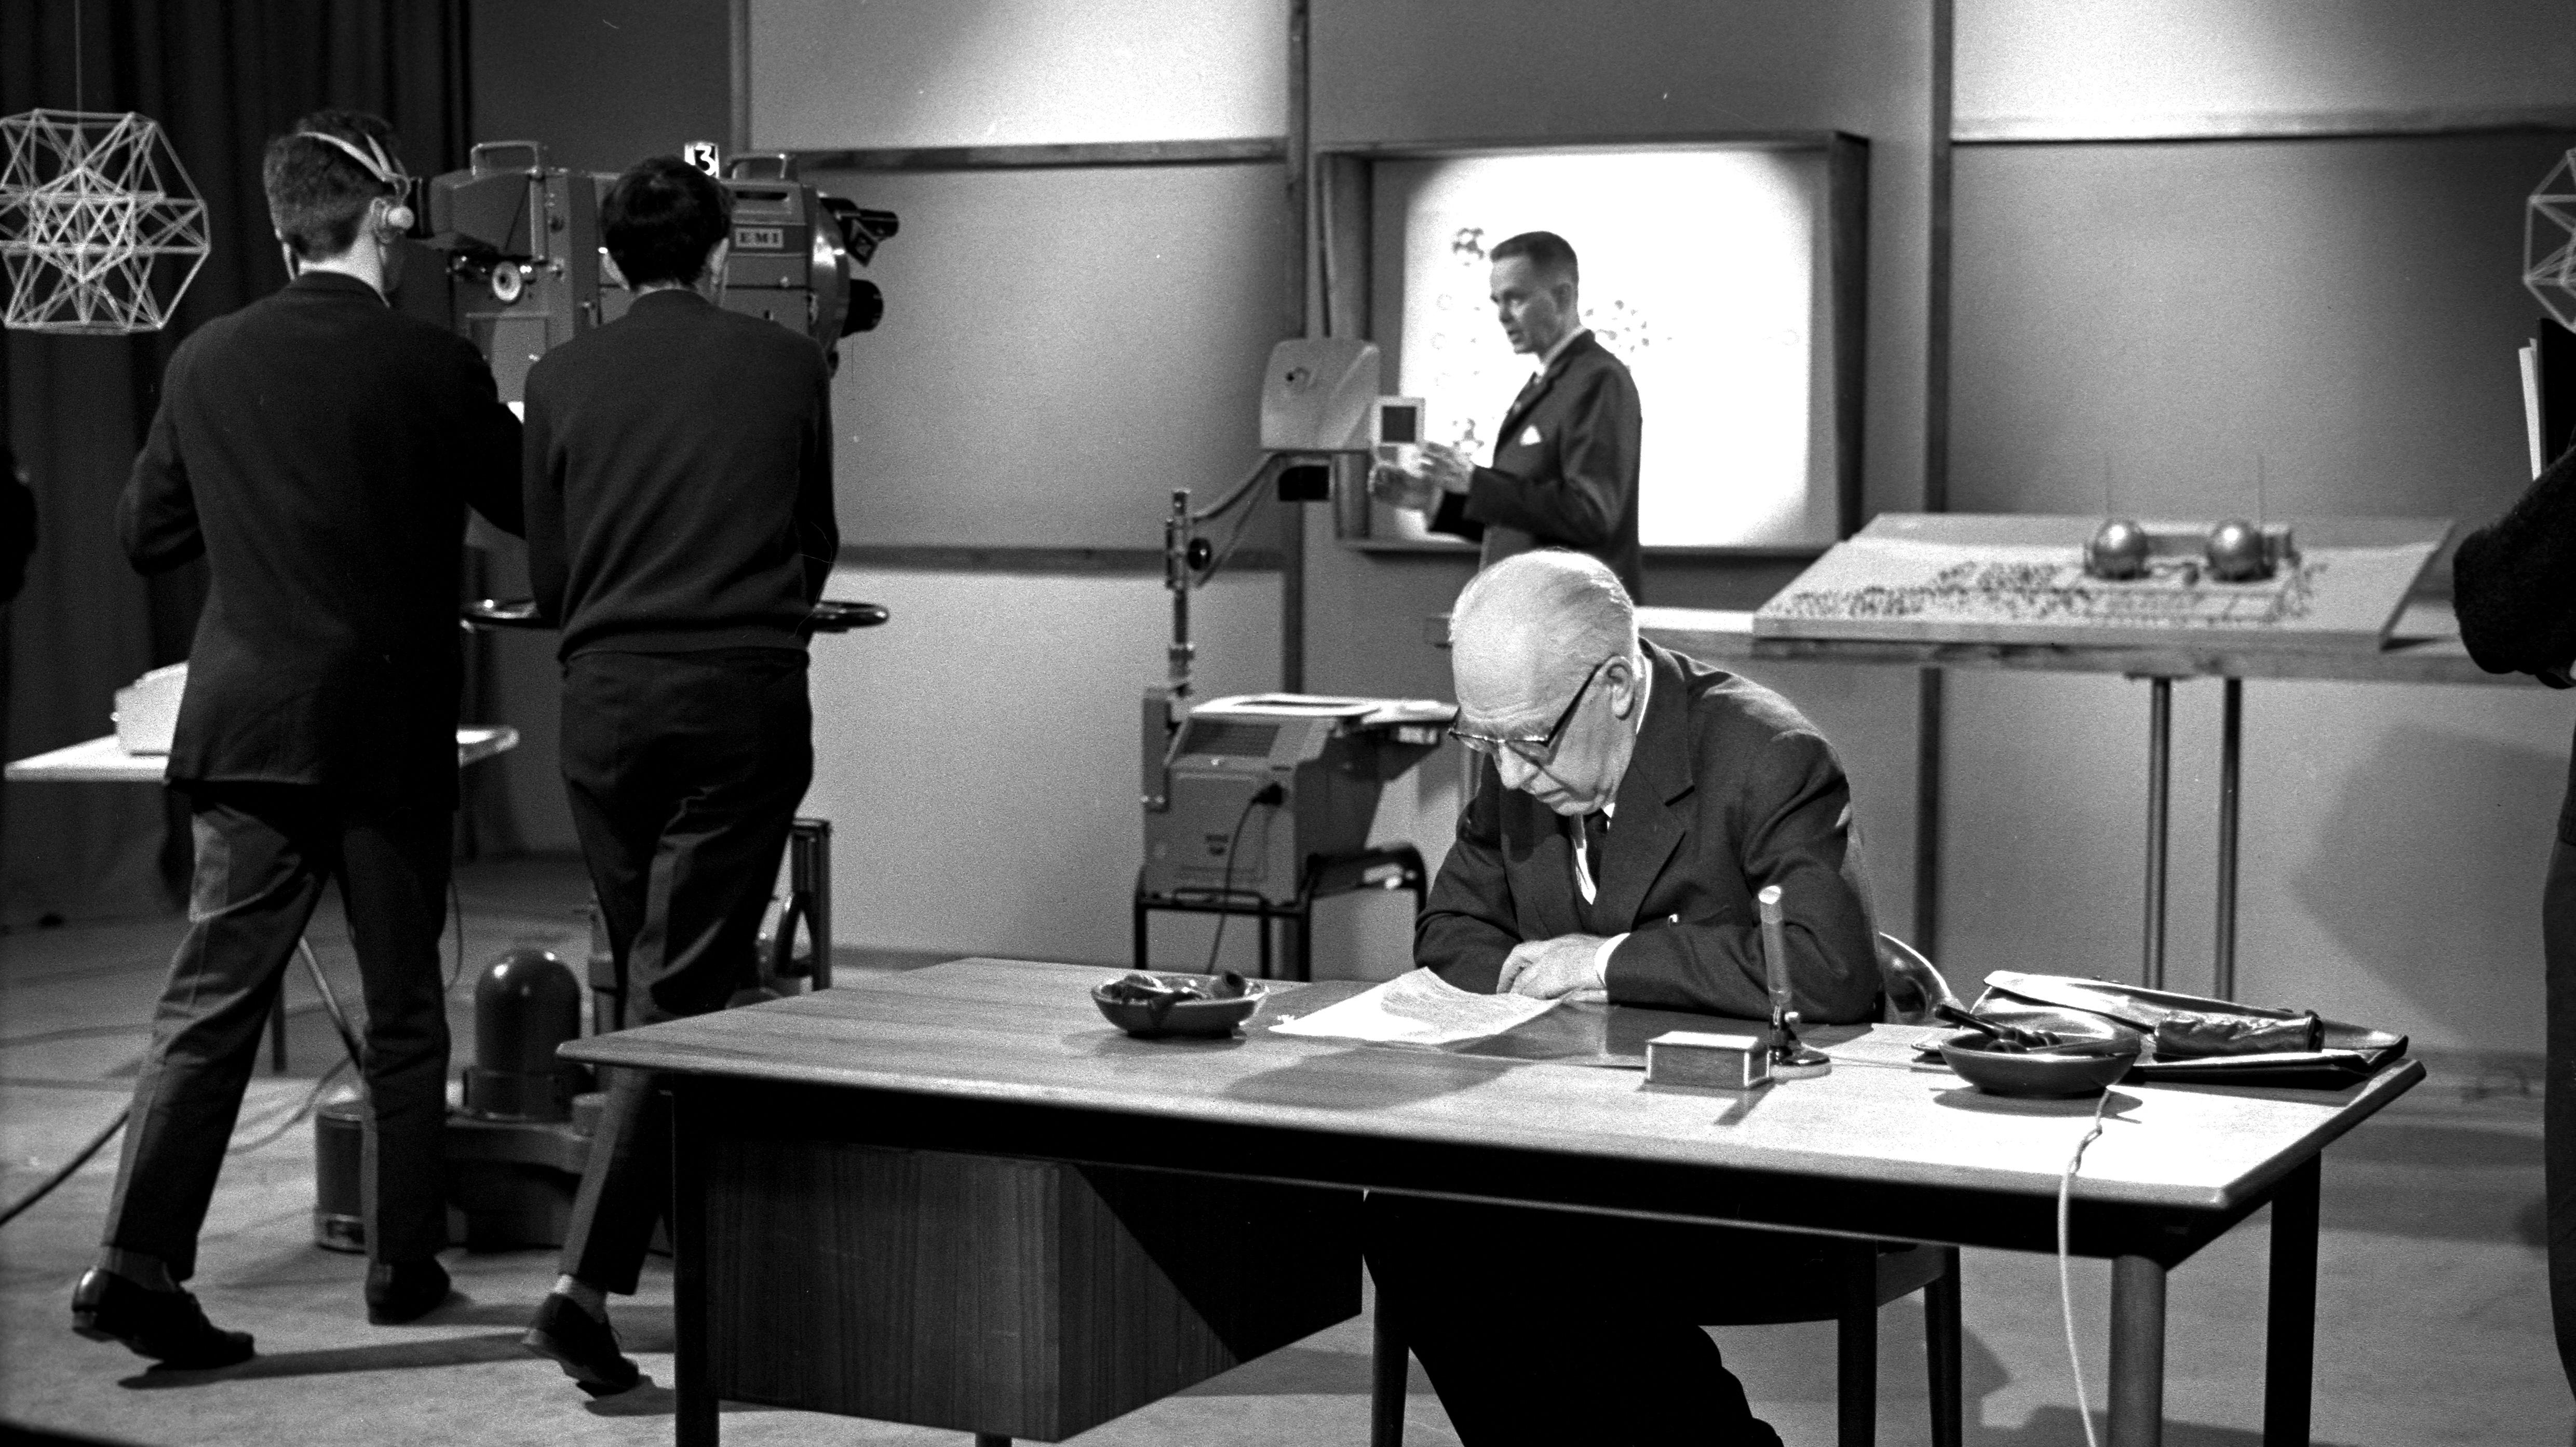 skole_tv_udsendelse_atomerne_1962_medvirkende_niels_bohr_1688_210367.jpg